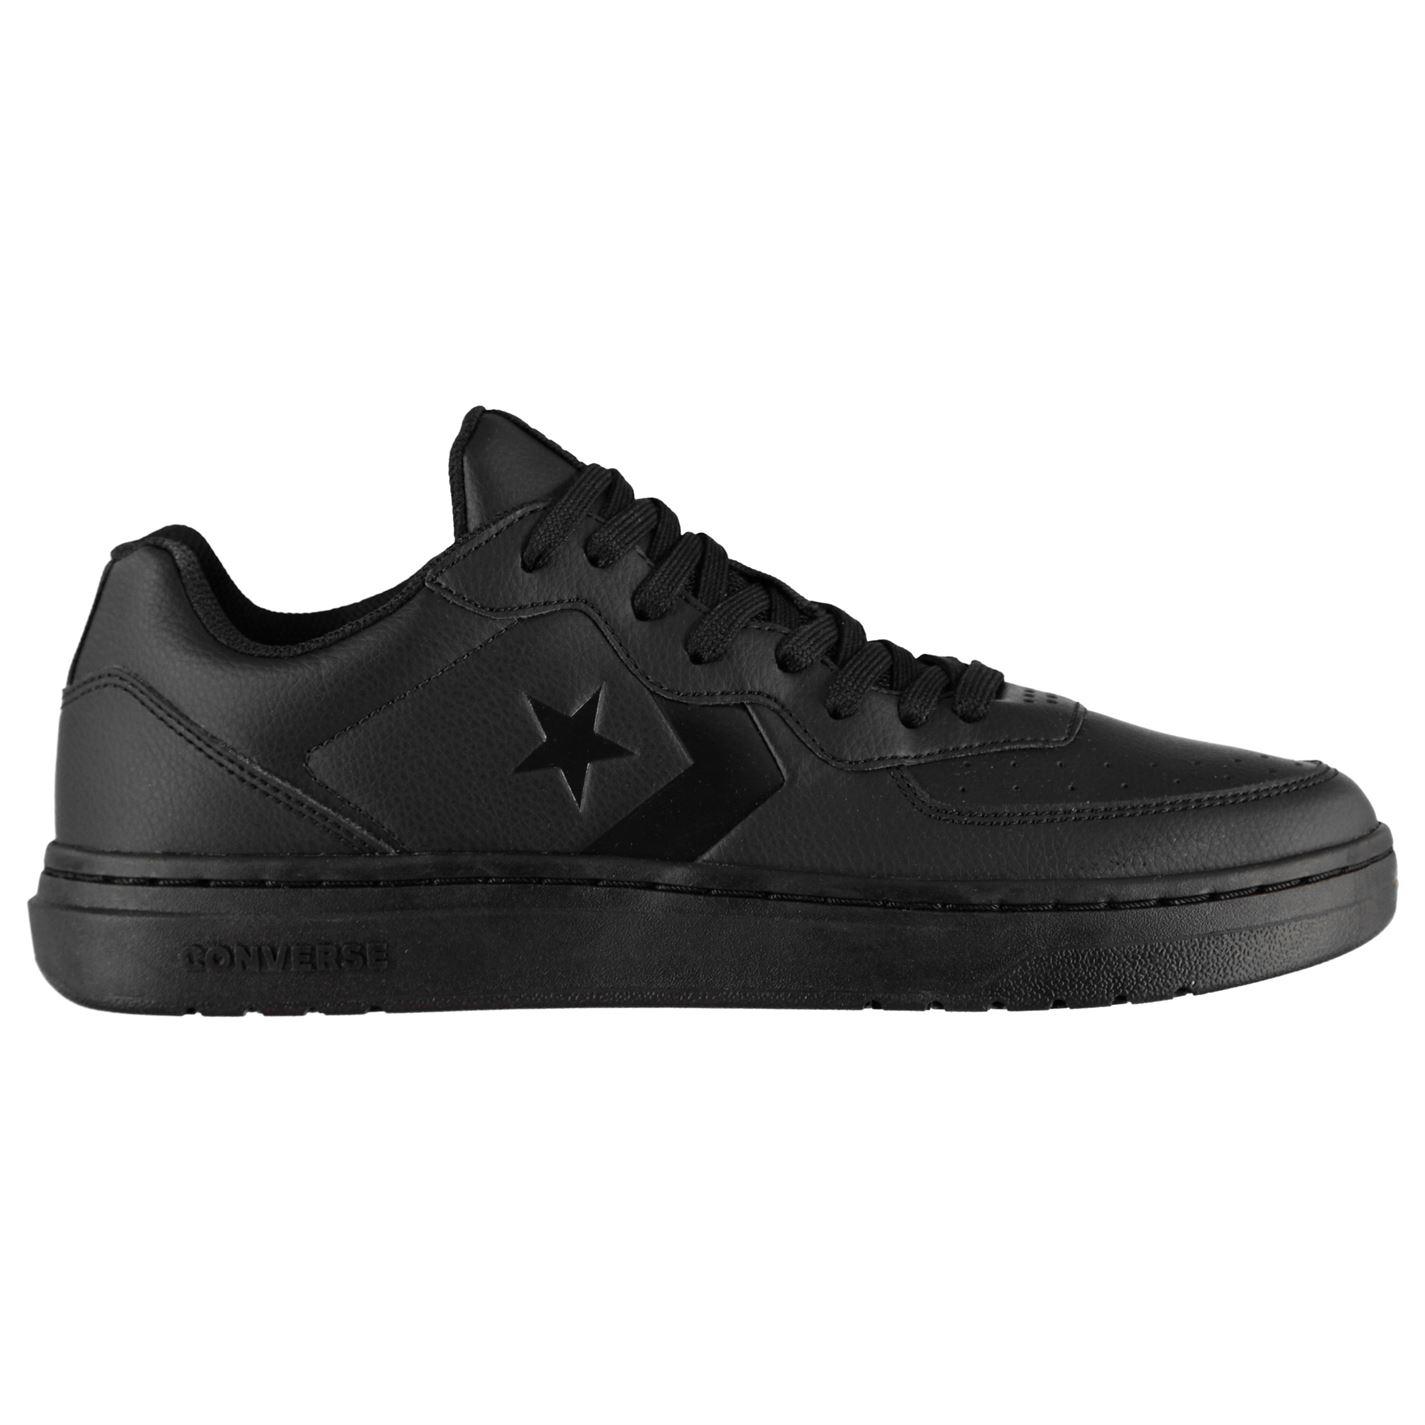 Adidasi sport Converse Ox Rival negru mono